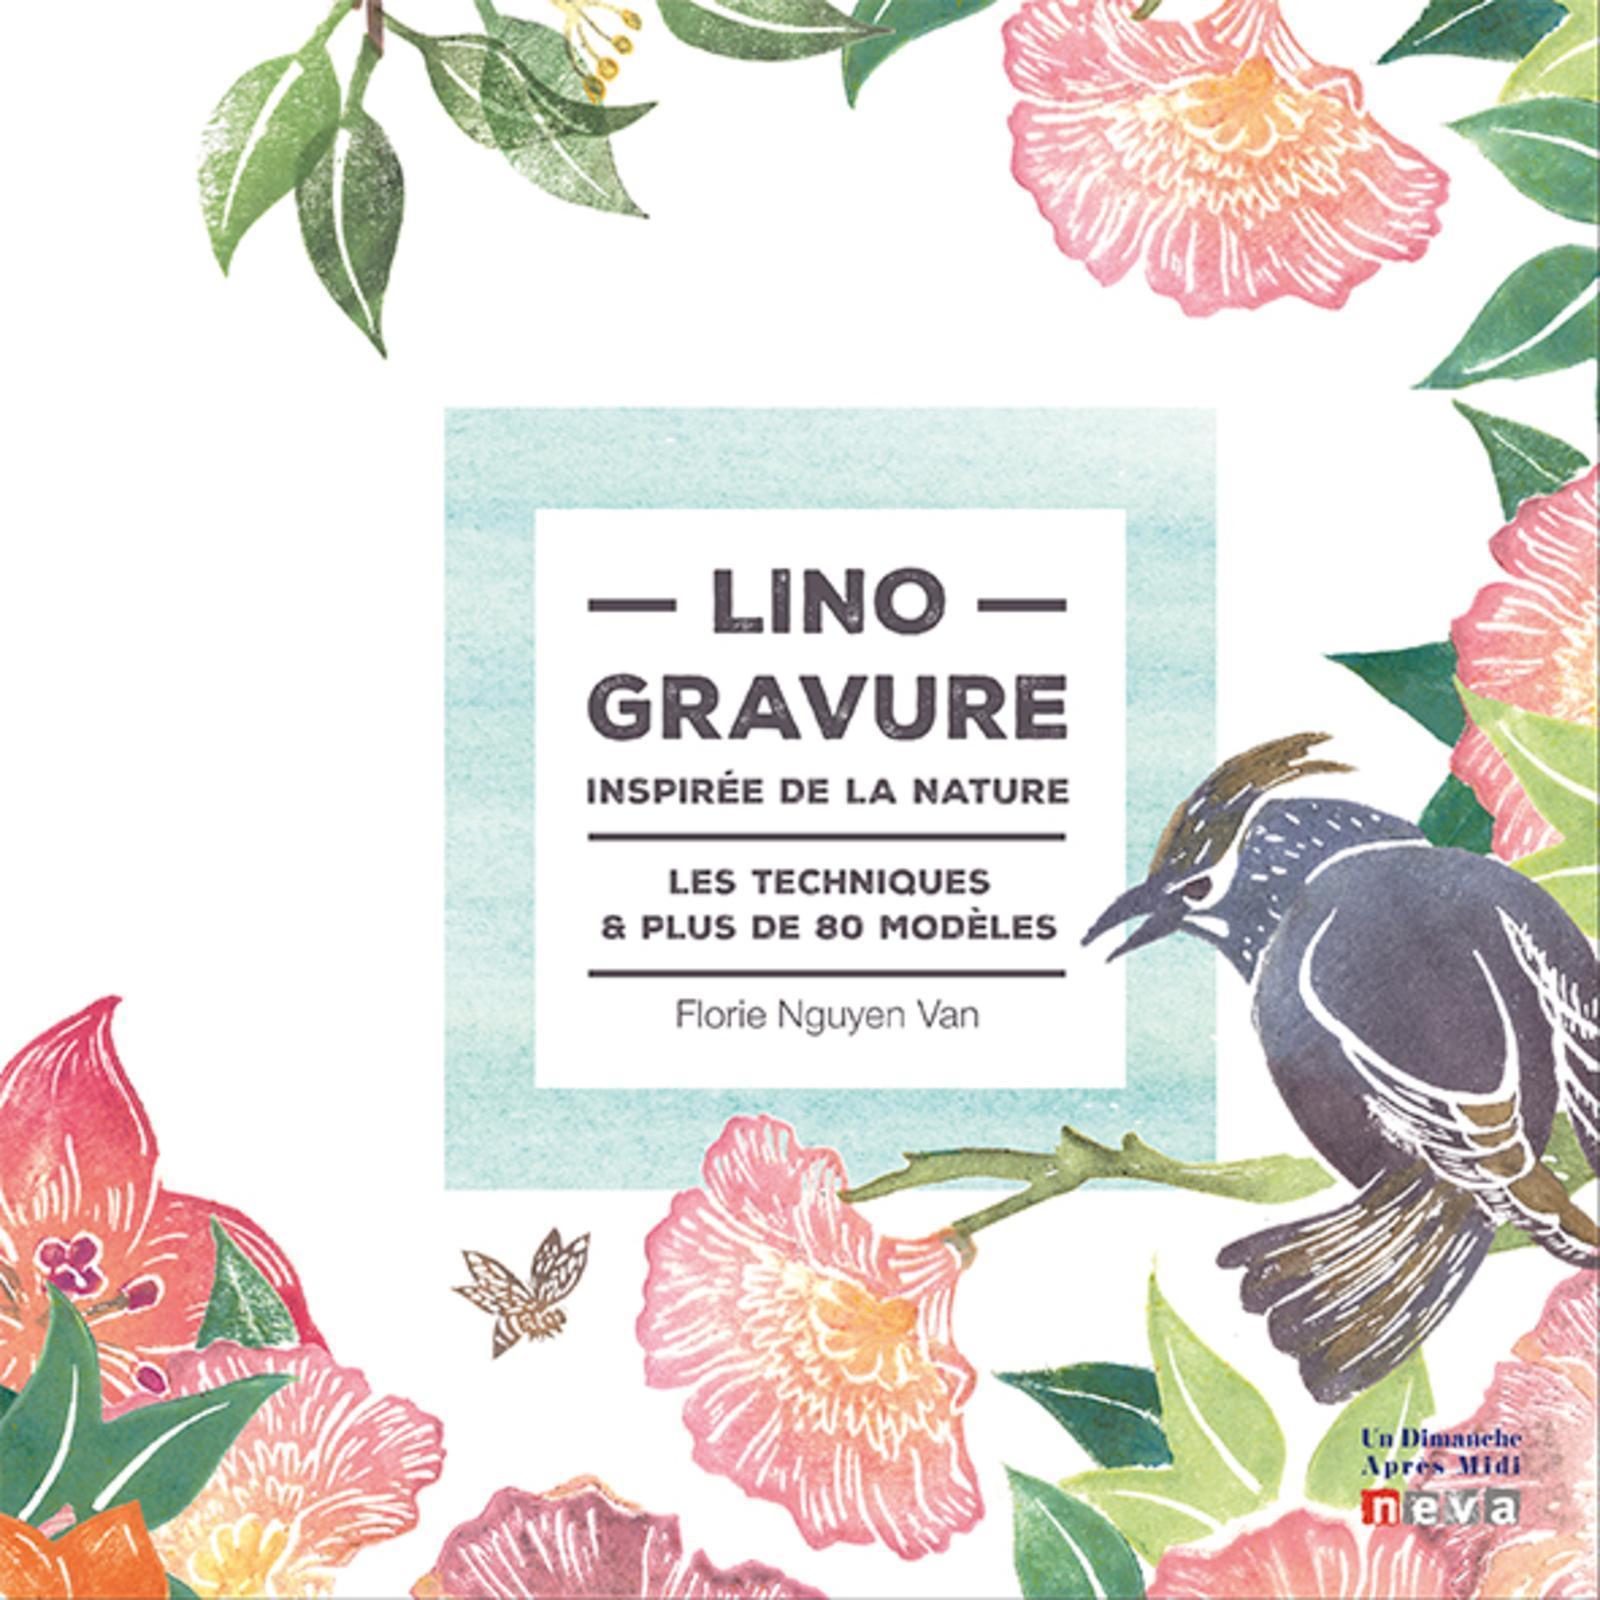 LINOGRAVURE INSPIREE DE LA NATURE - 60 MODELES